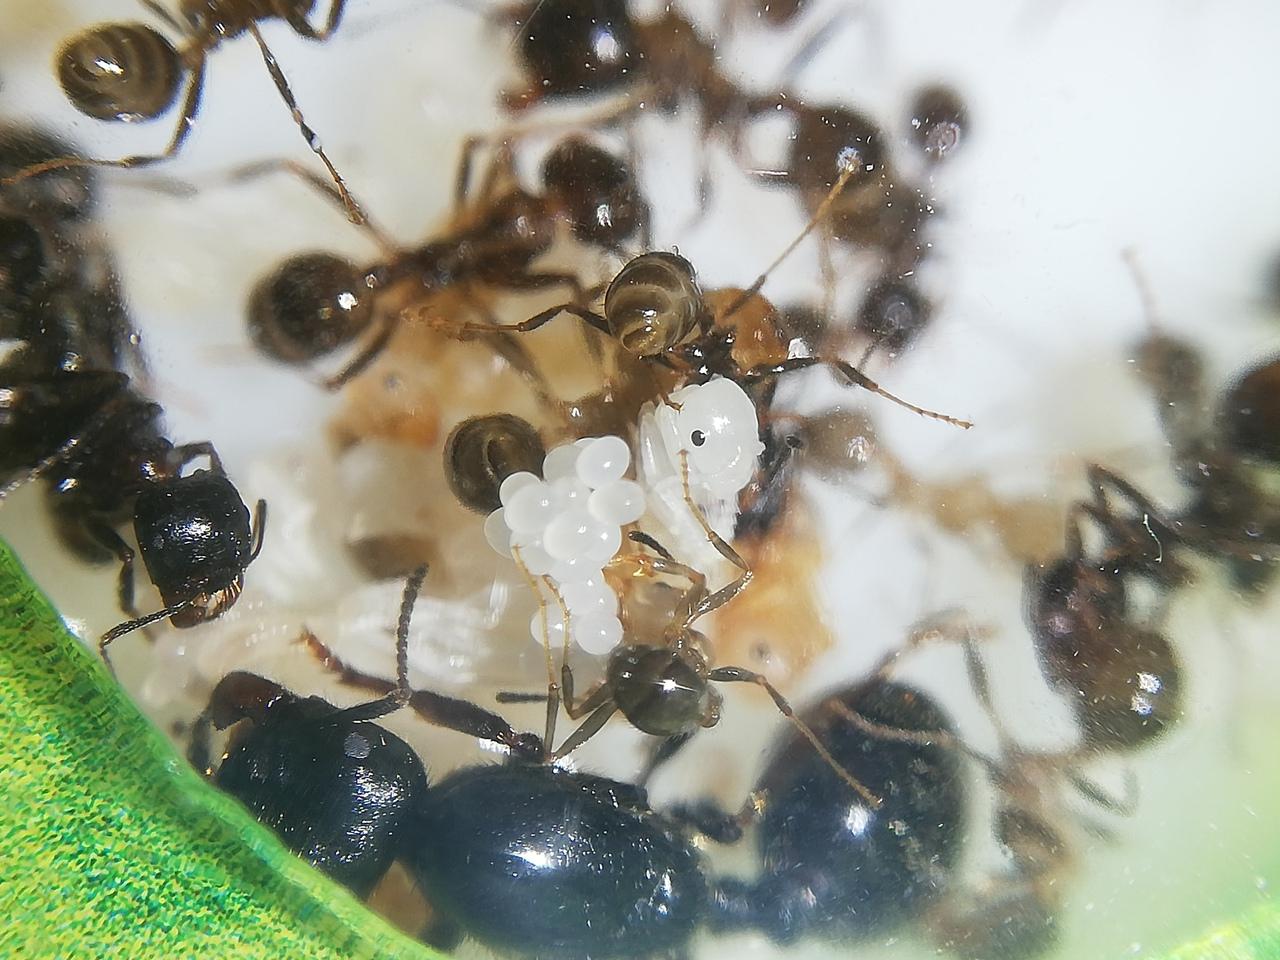 макро фото муравьев